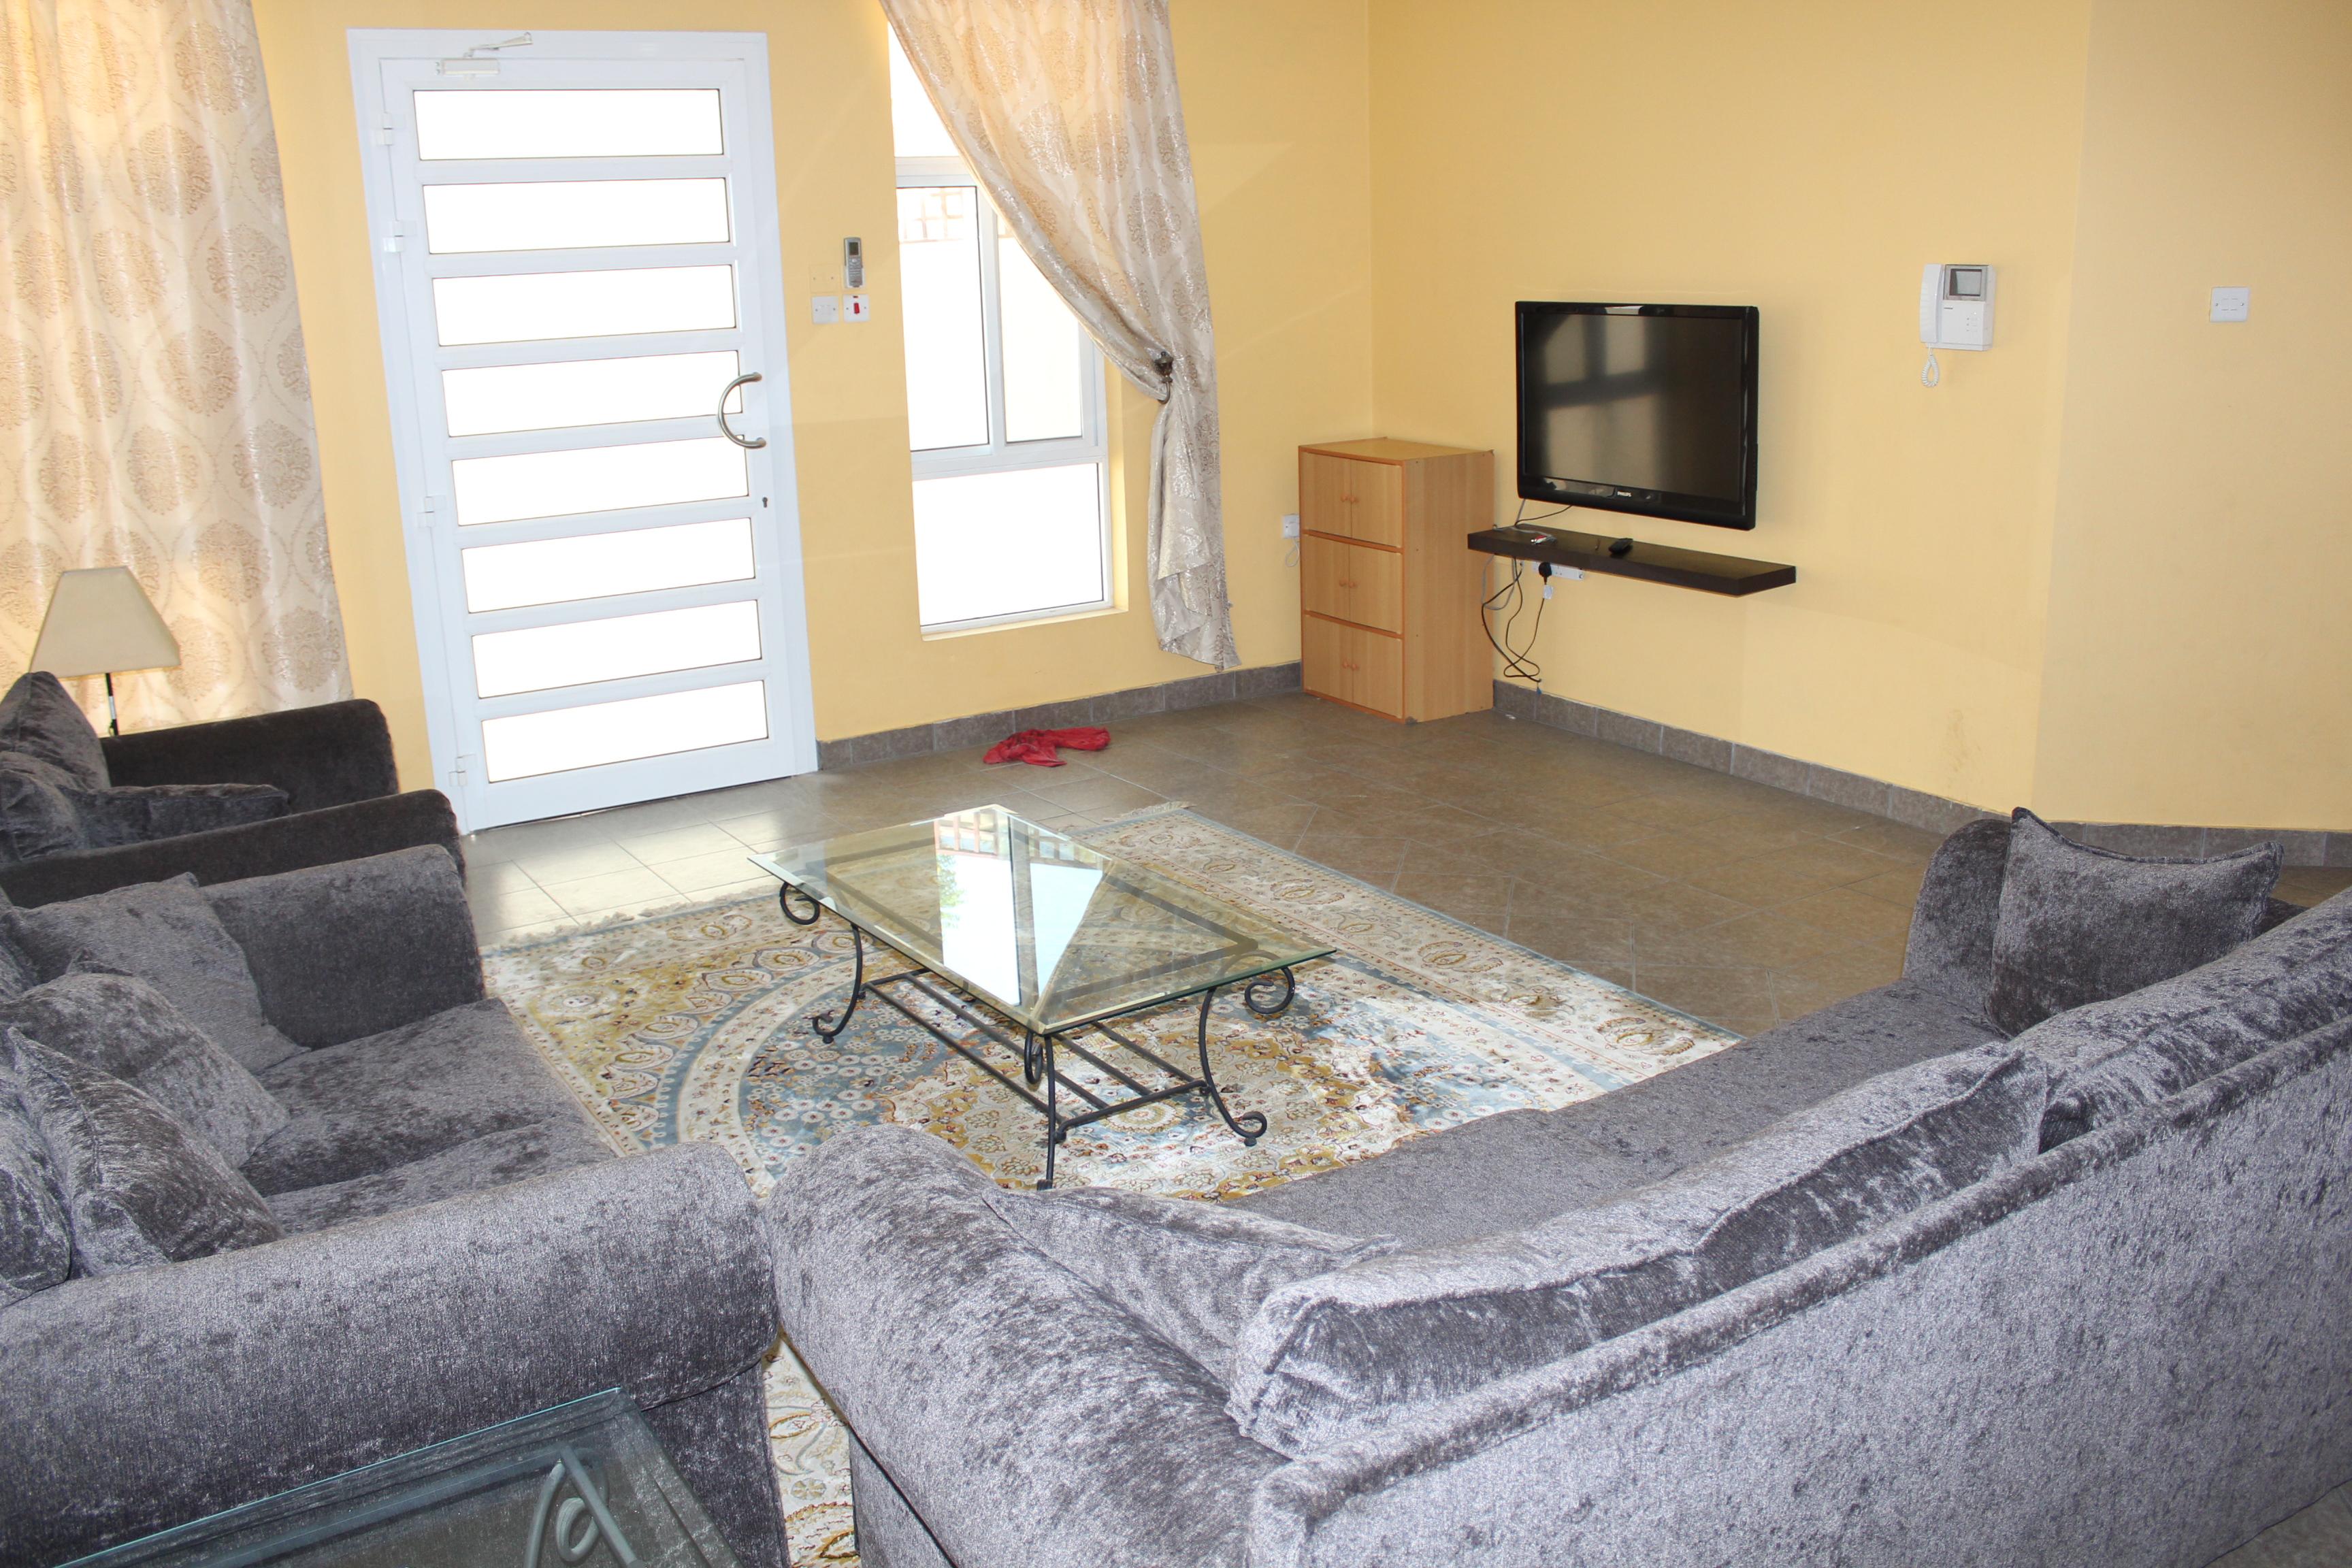 Two Bedroom Duplex Apartment1